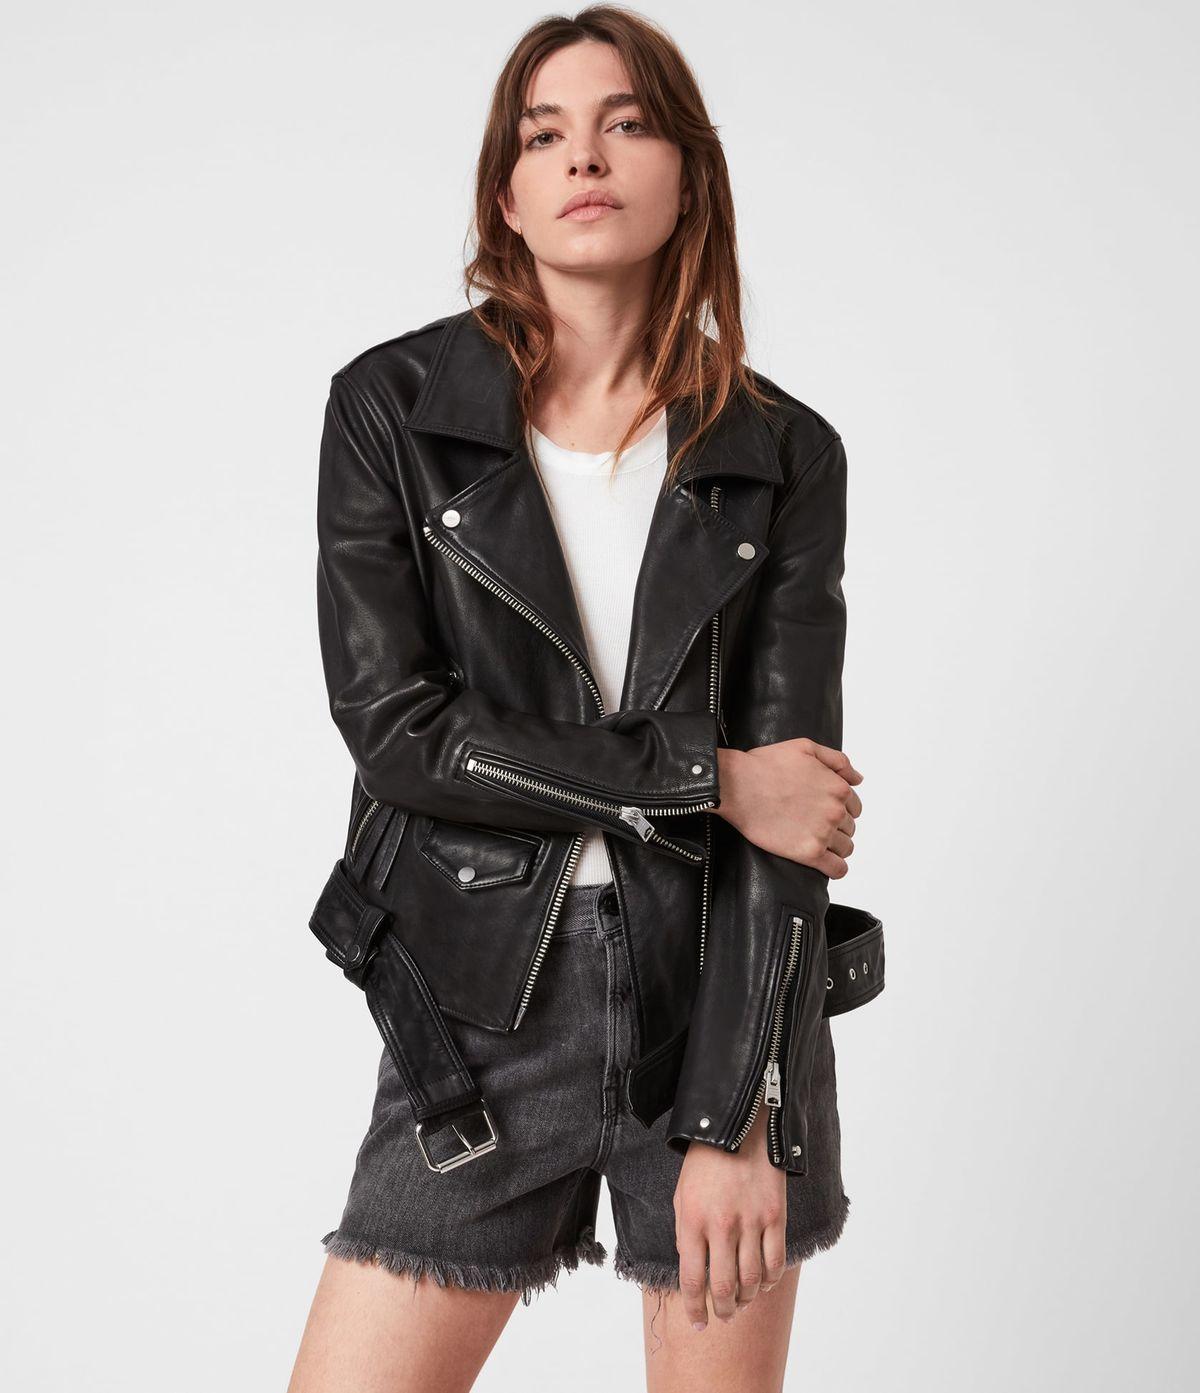 Women's Luna Leather Jacket - Front View